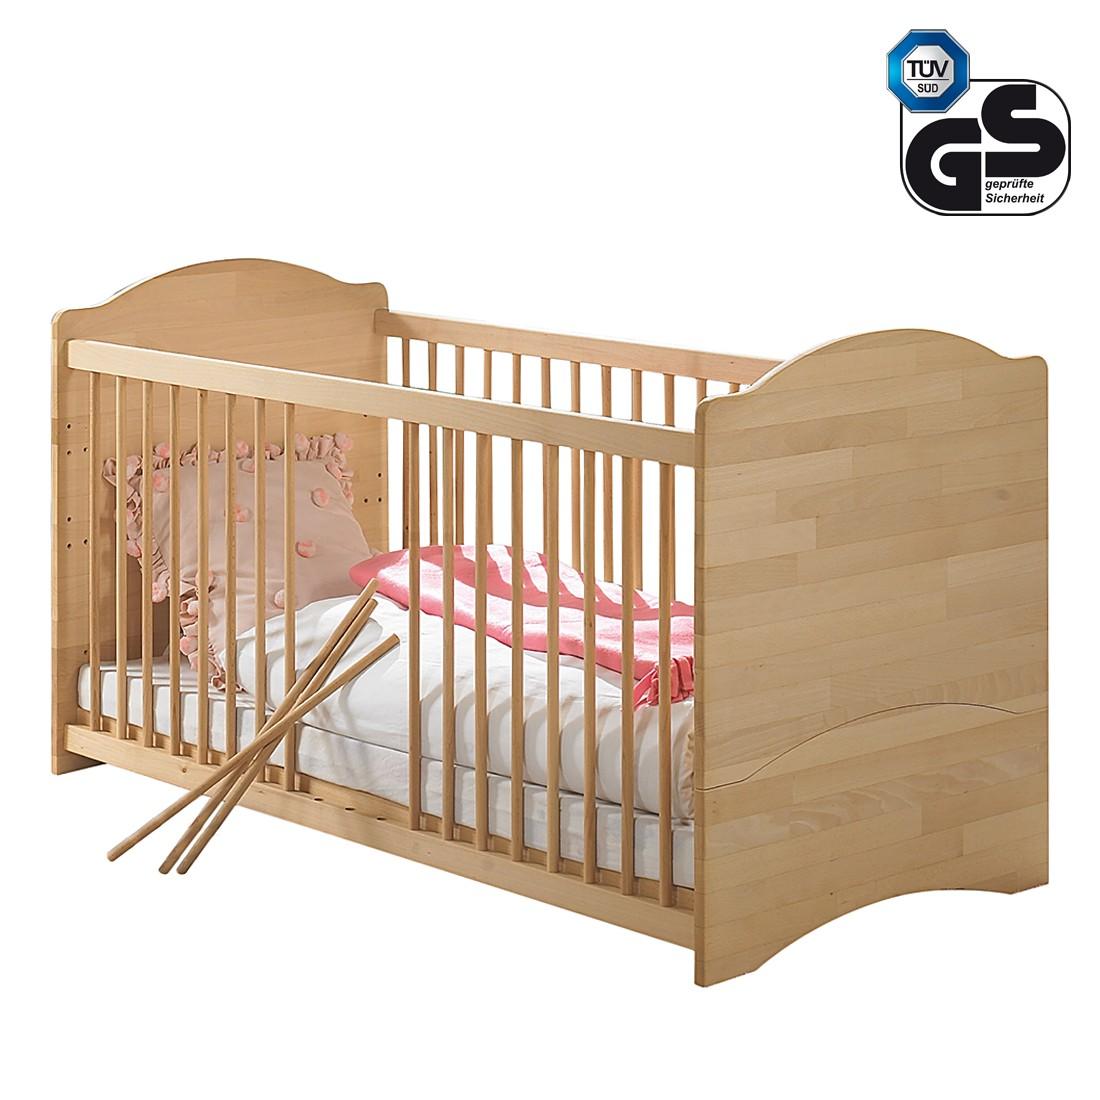 babybett massivholz preisvergleiche erfahrungsberichte. Black Bedroom Furniture Sets. Home Design Ideas